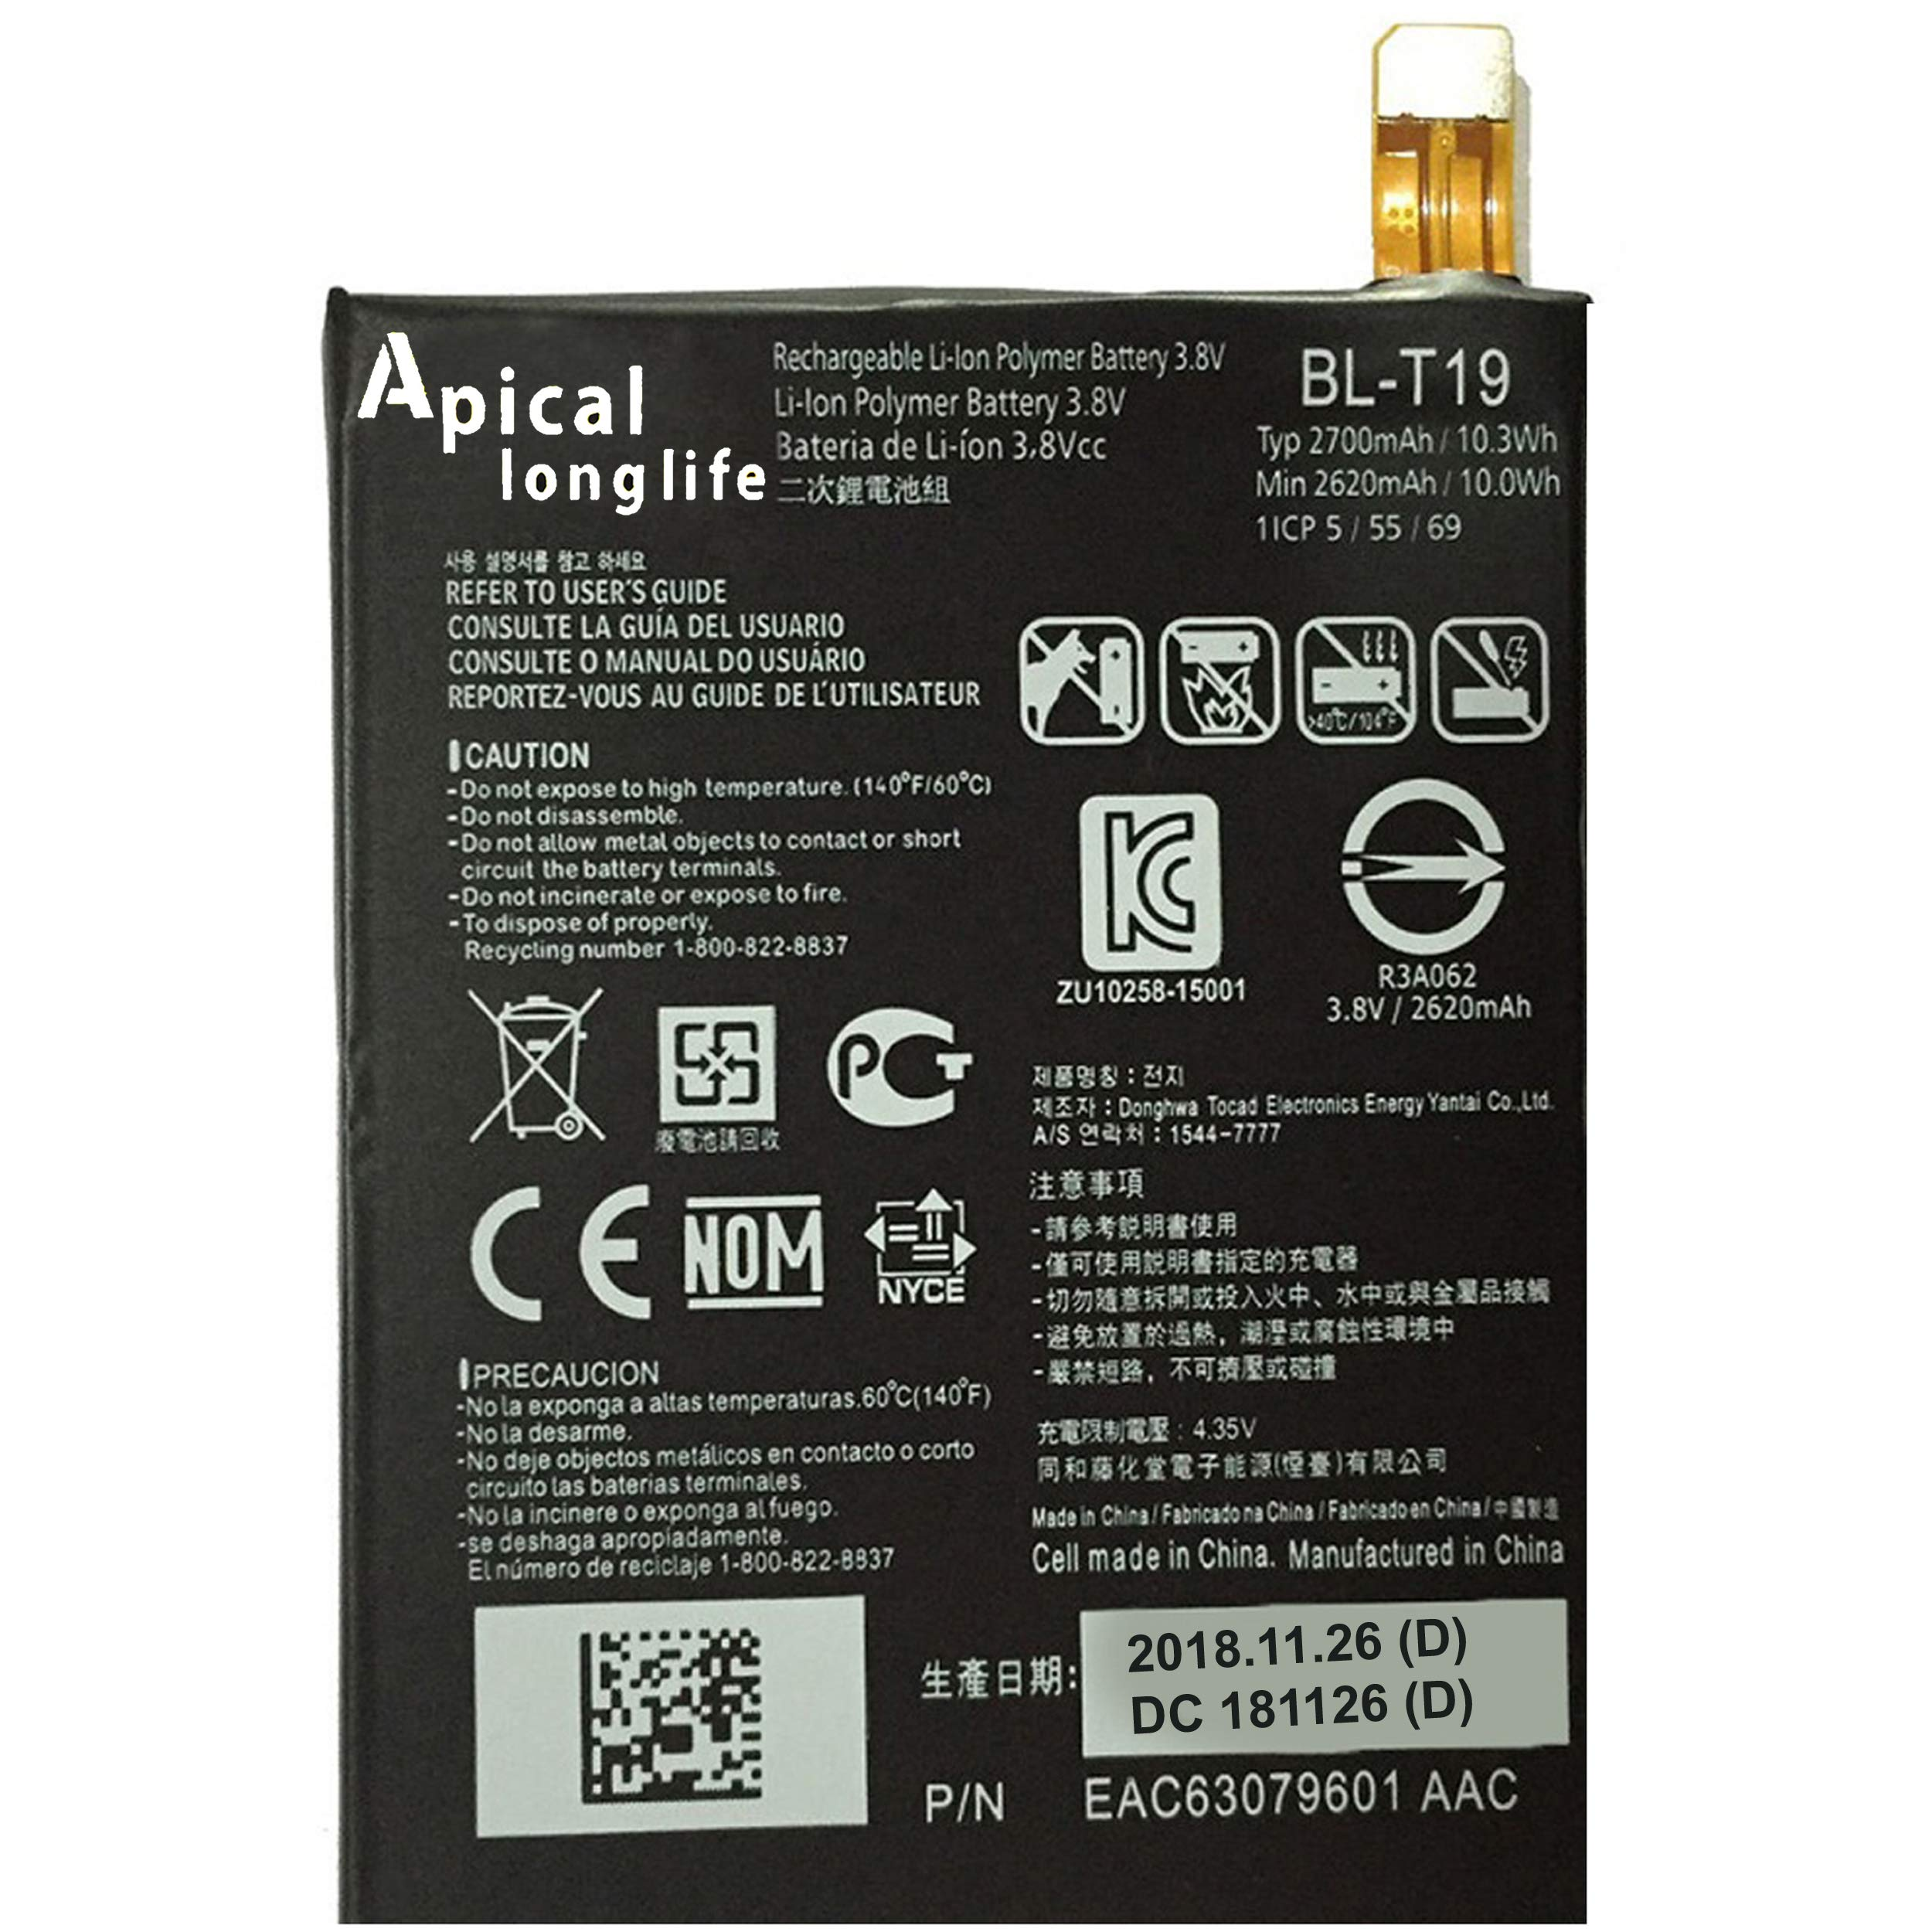 Bateria Celular Longlife Bl T19 Li Ion 2700mah Para H791 H798 H790 Google Nexus 5x Batería De Repuesto